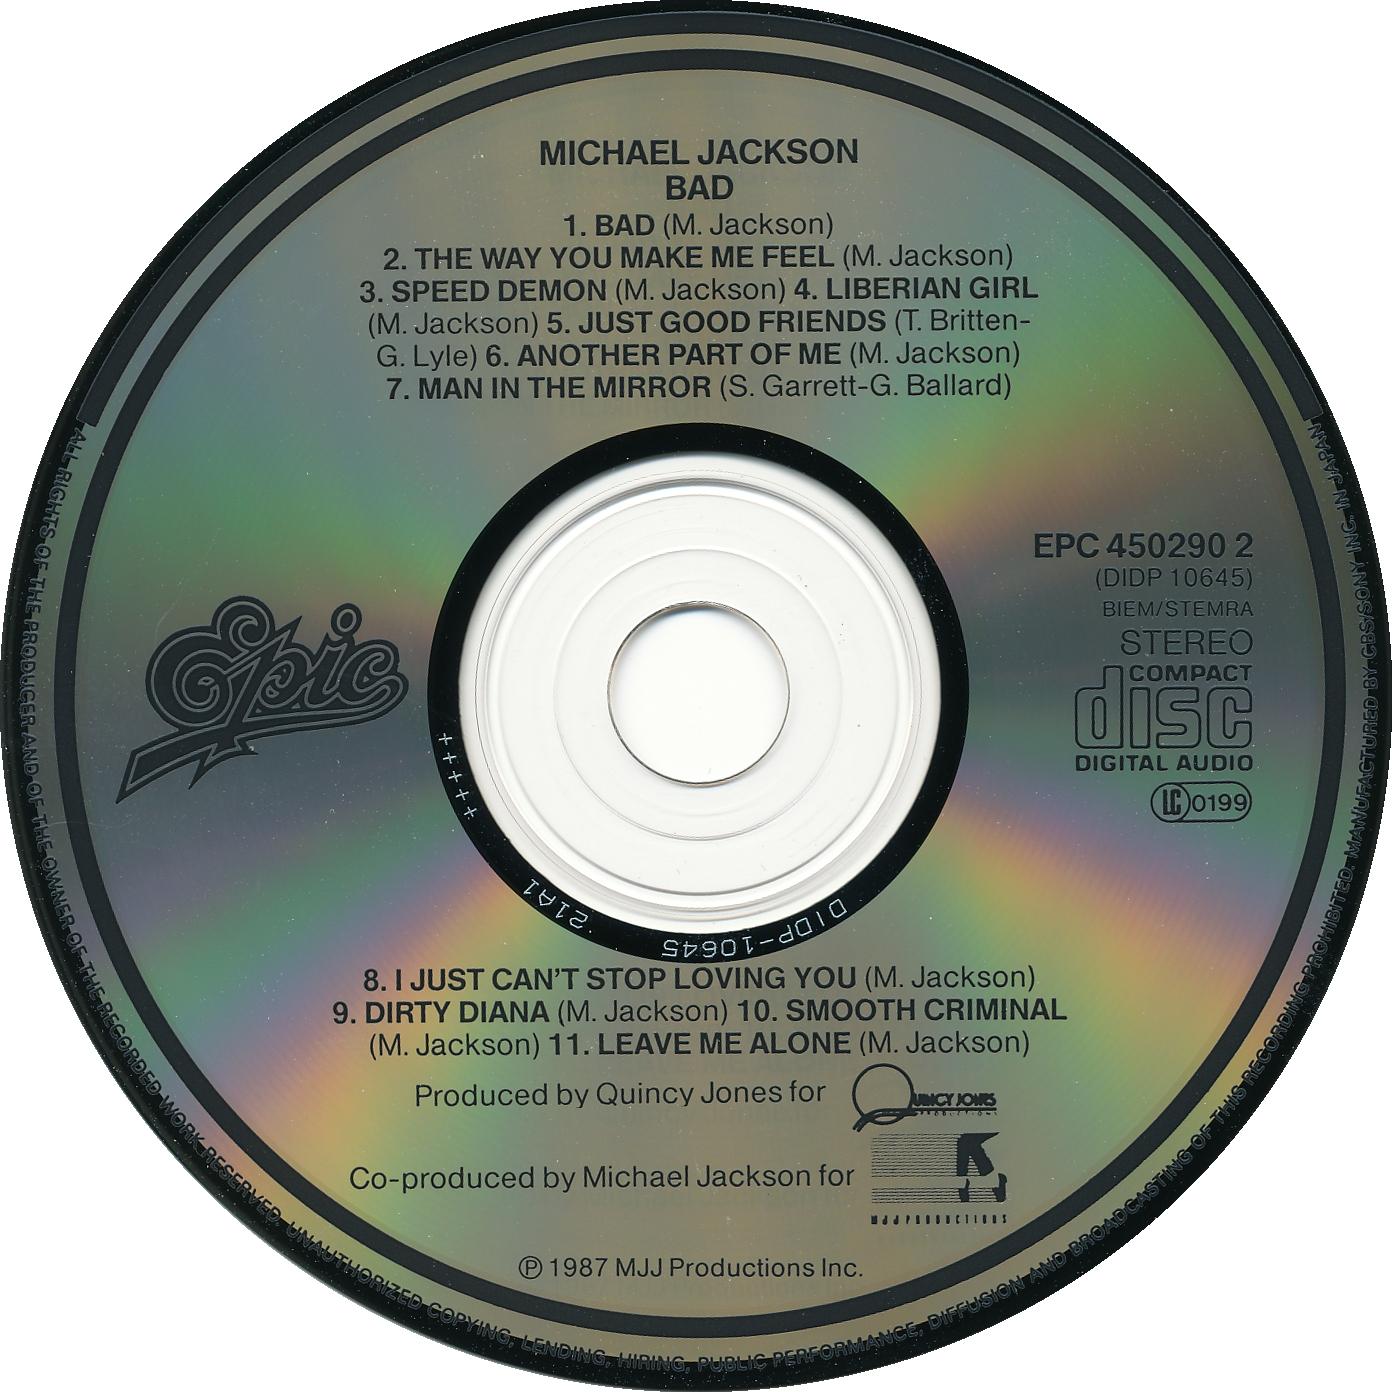 http://3.bp.blogspot.com/_yRxfvH6kBOI/TMSmcKmJEbI/AAAAAAAAAmI/TgCNtn4fK1M/s1600/Michael+Jackson+-+Bad+-+CD.jpg